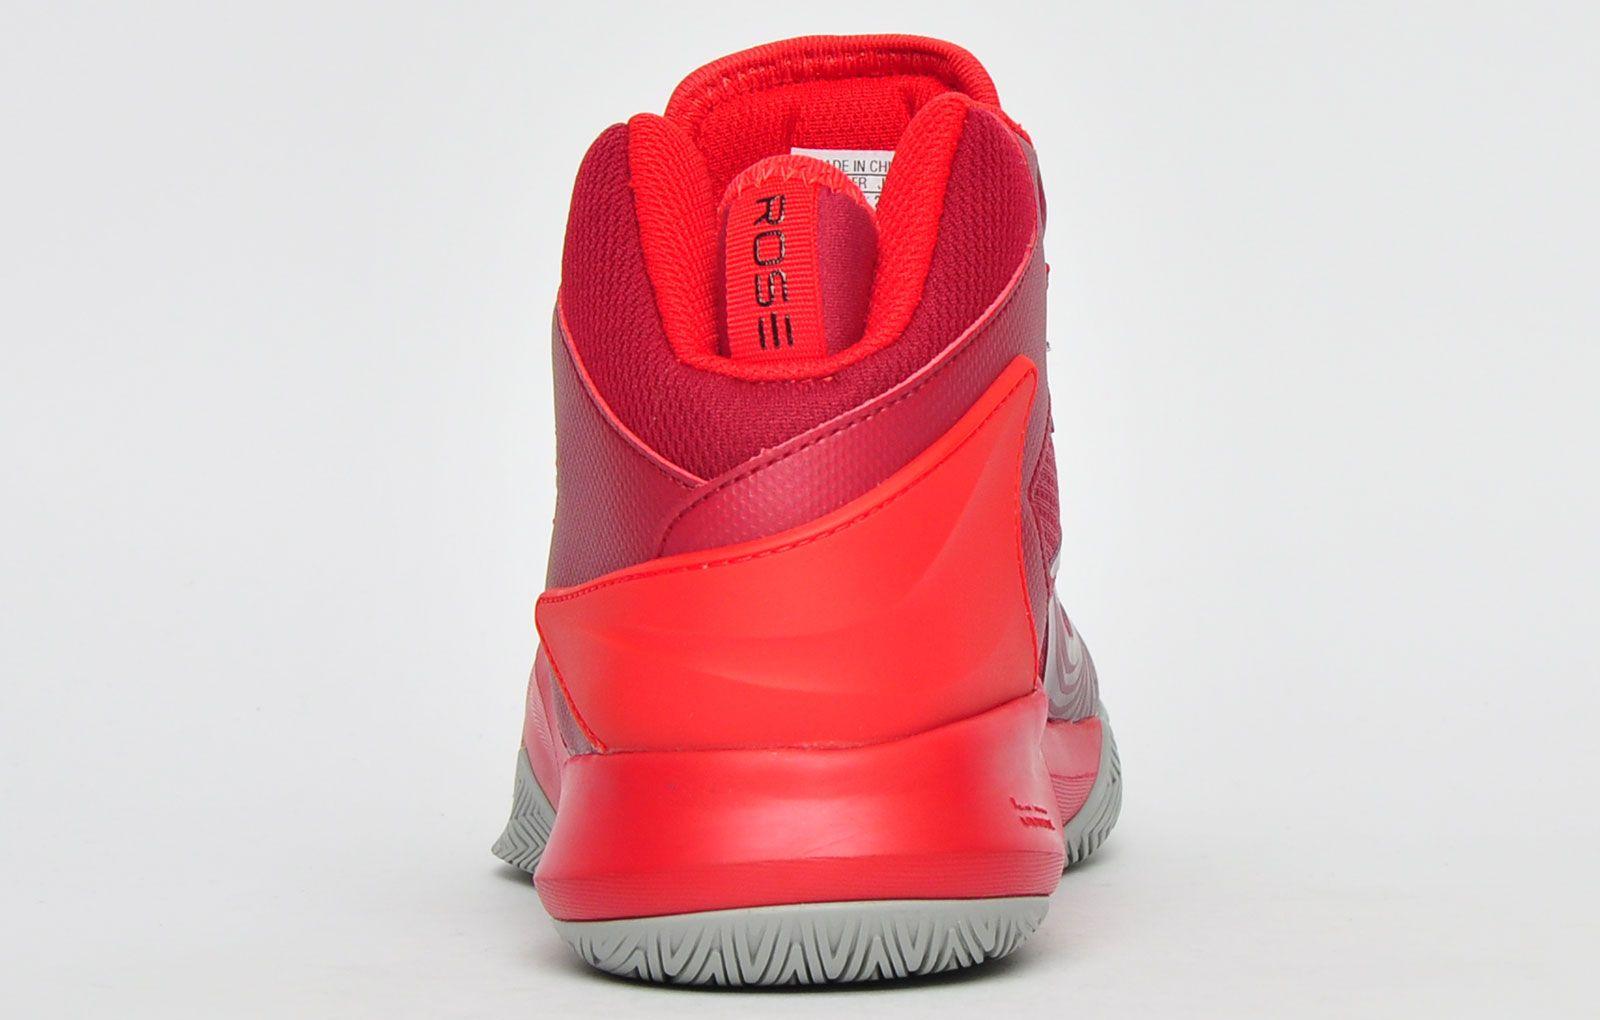 Adidas D Rose Dominate IV Mens